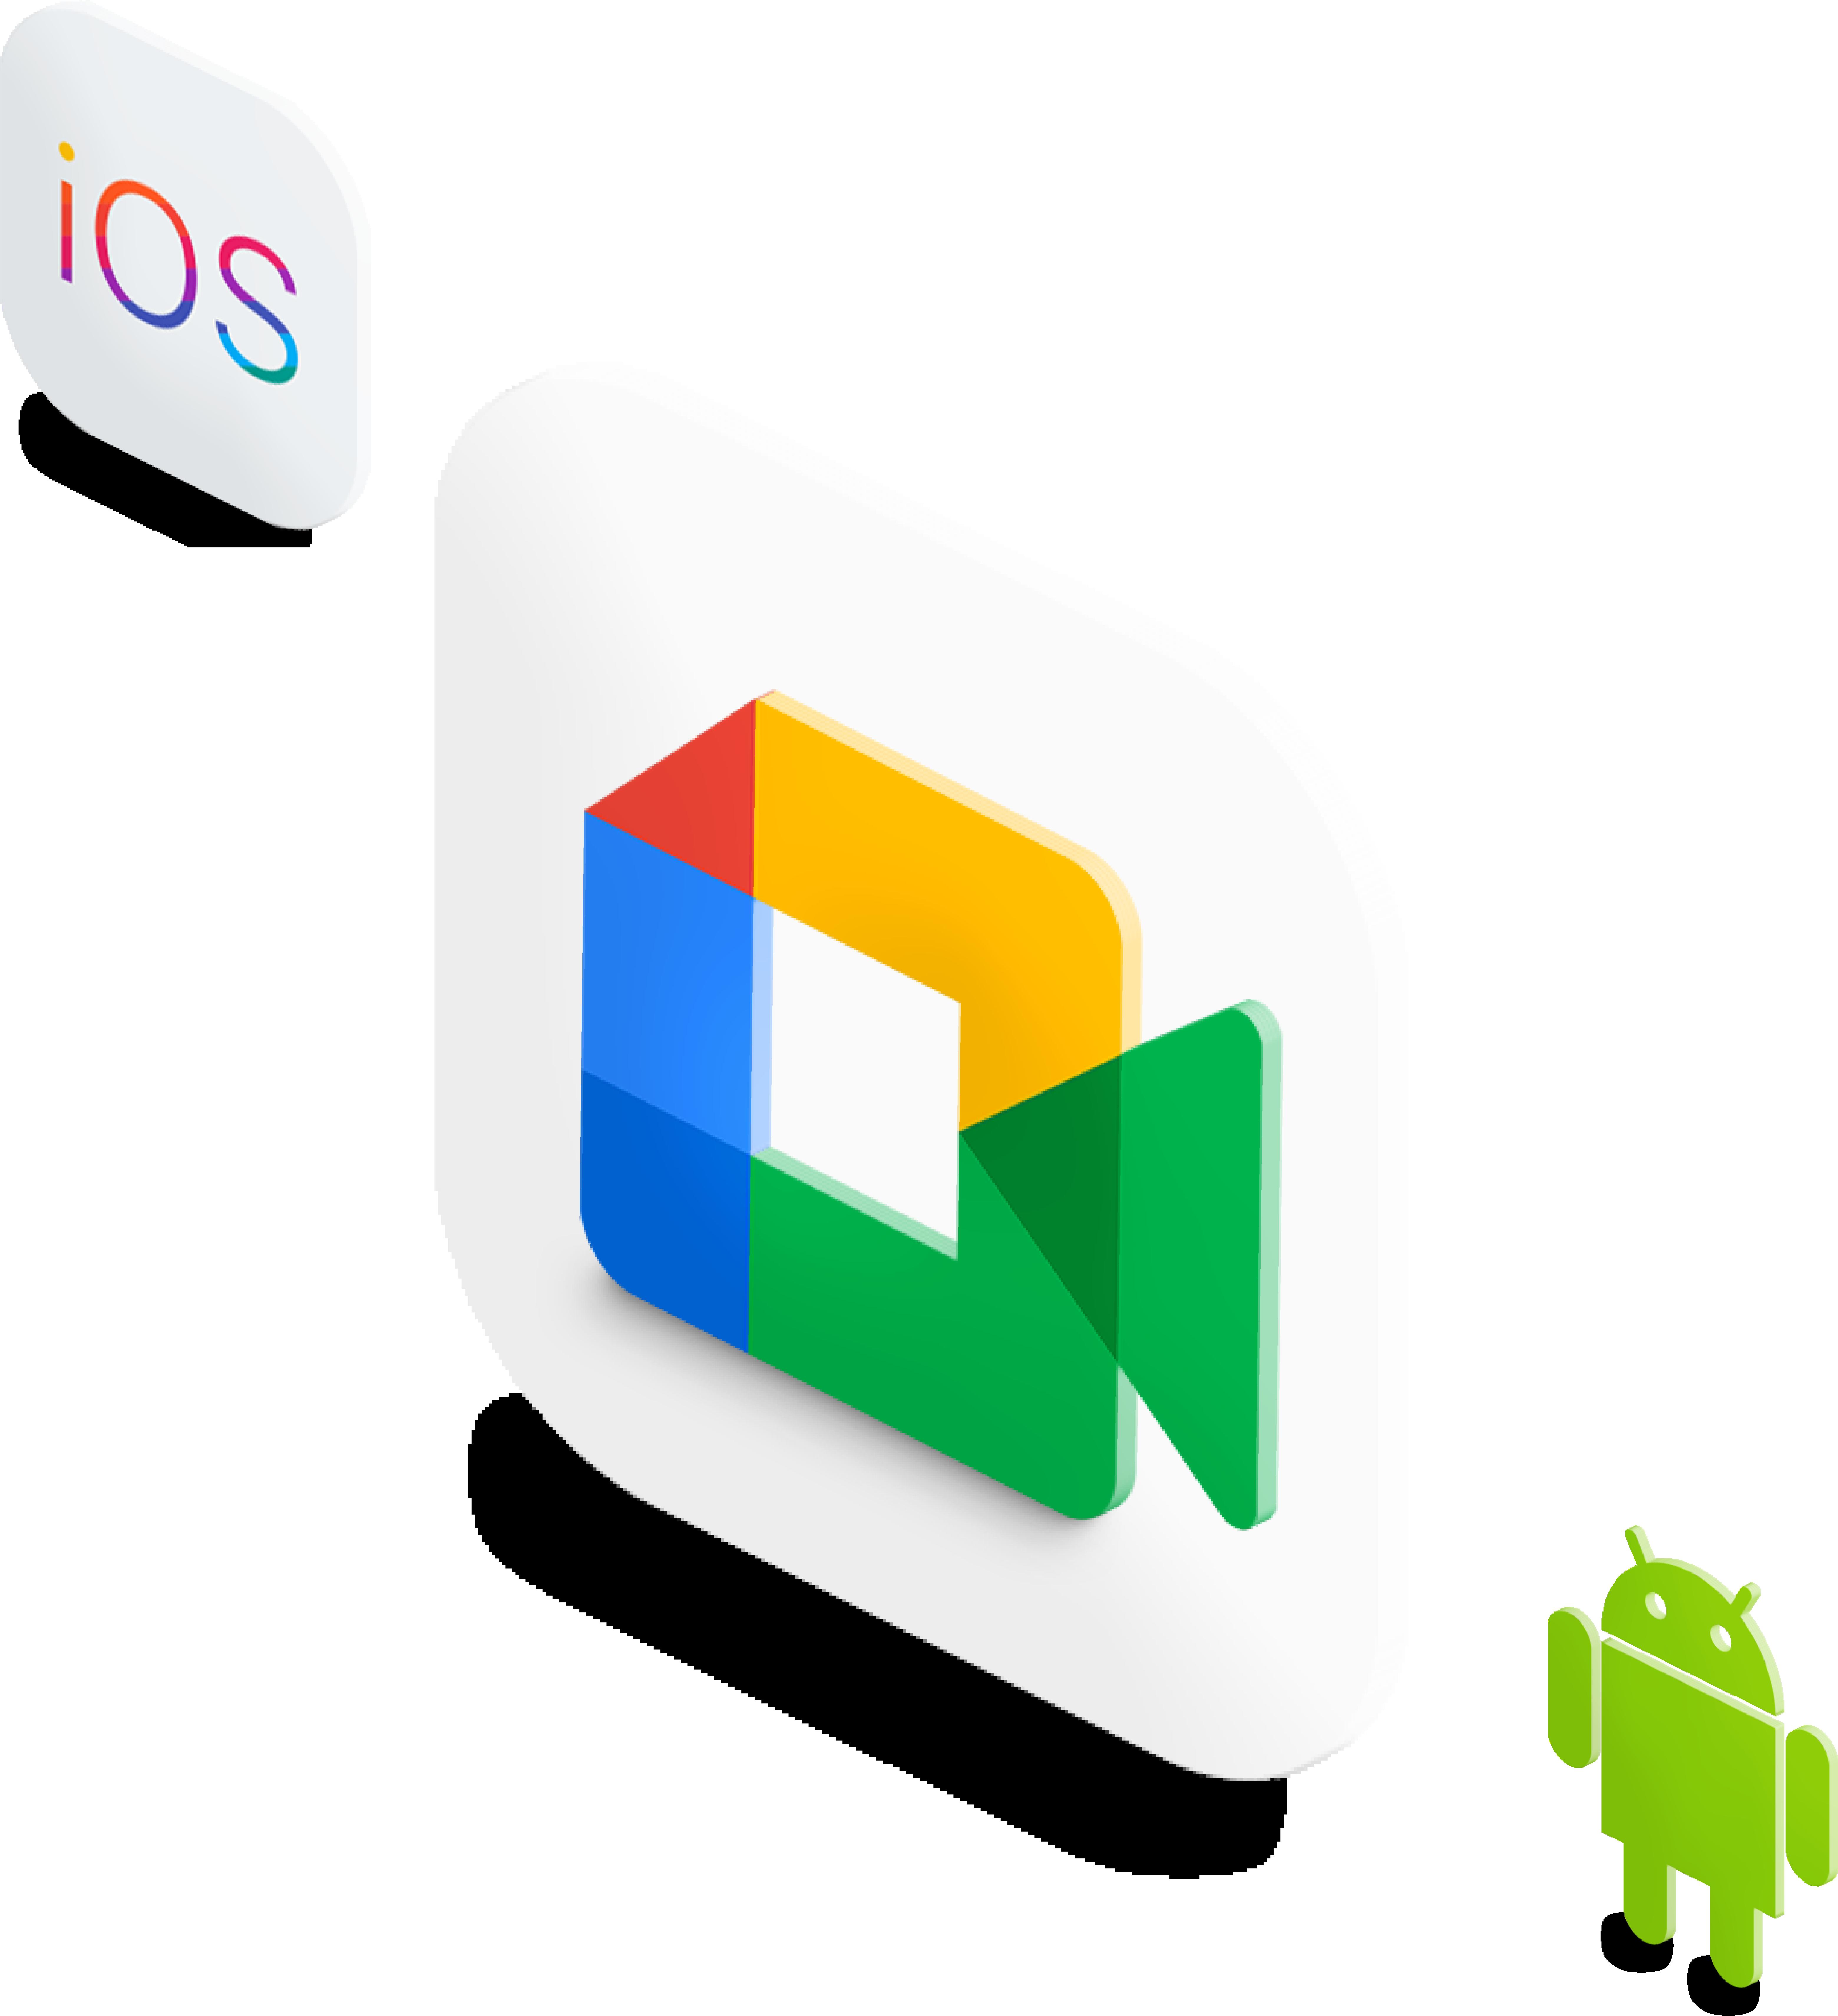 Google Meet: Accedi alle videochiamate dal browser o dall'App iOs o Android